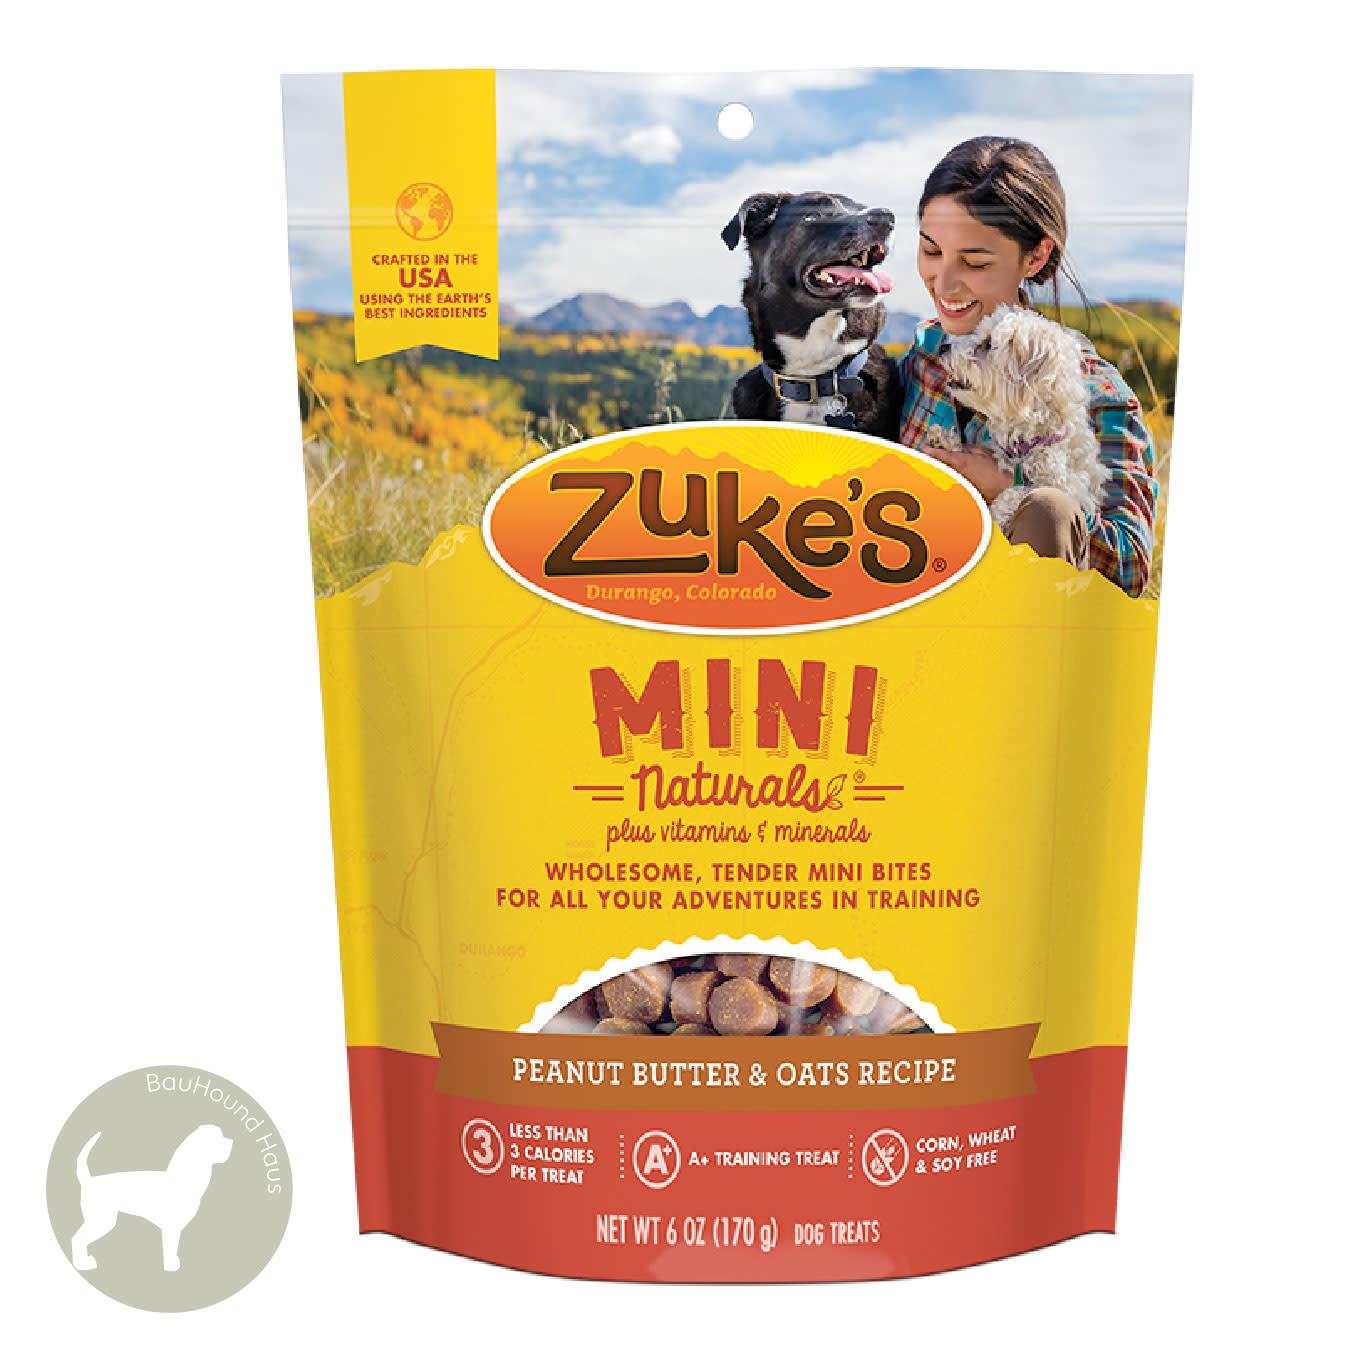 Zukes Zukes Mini Naturals Peanut Butter Treats, 6oz